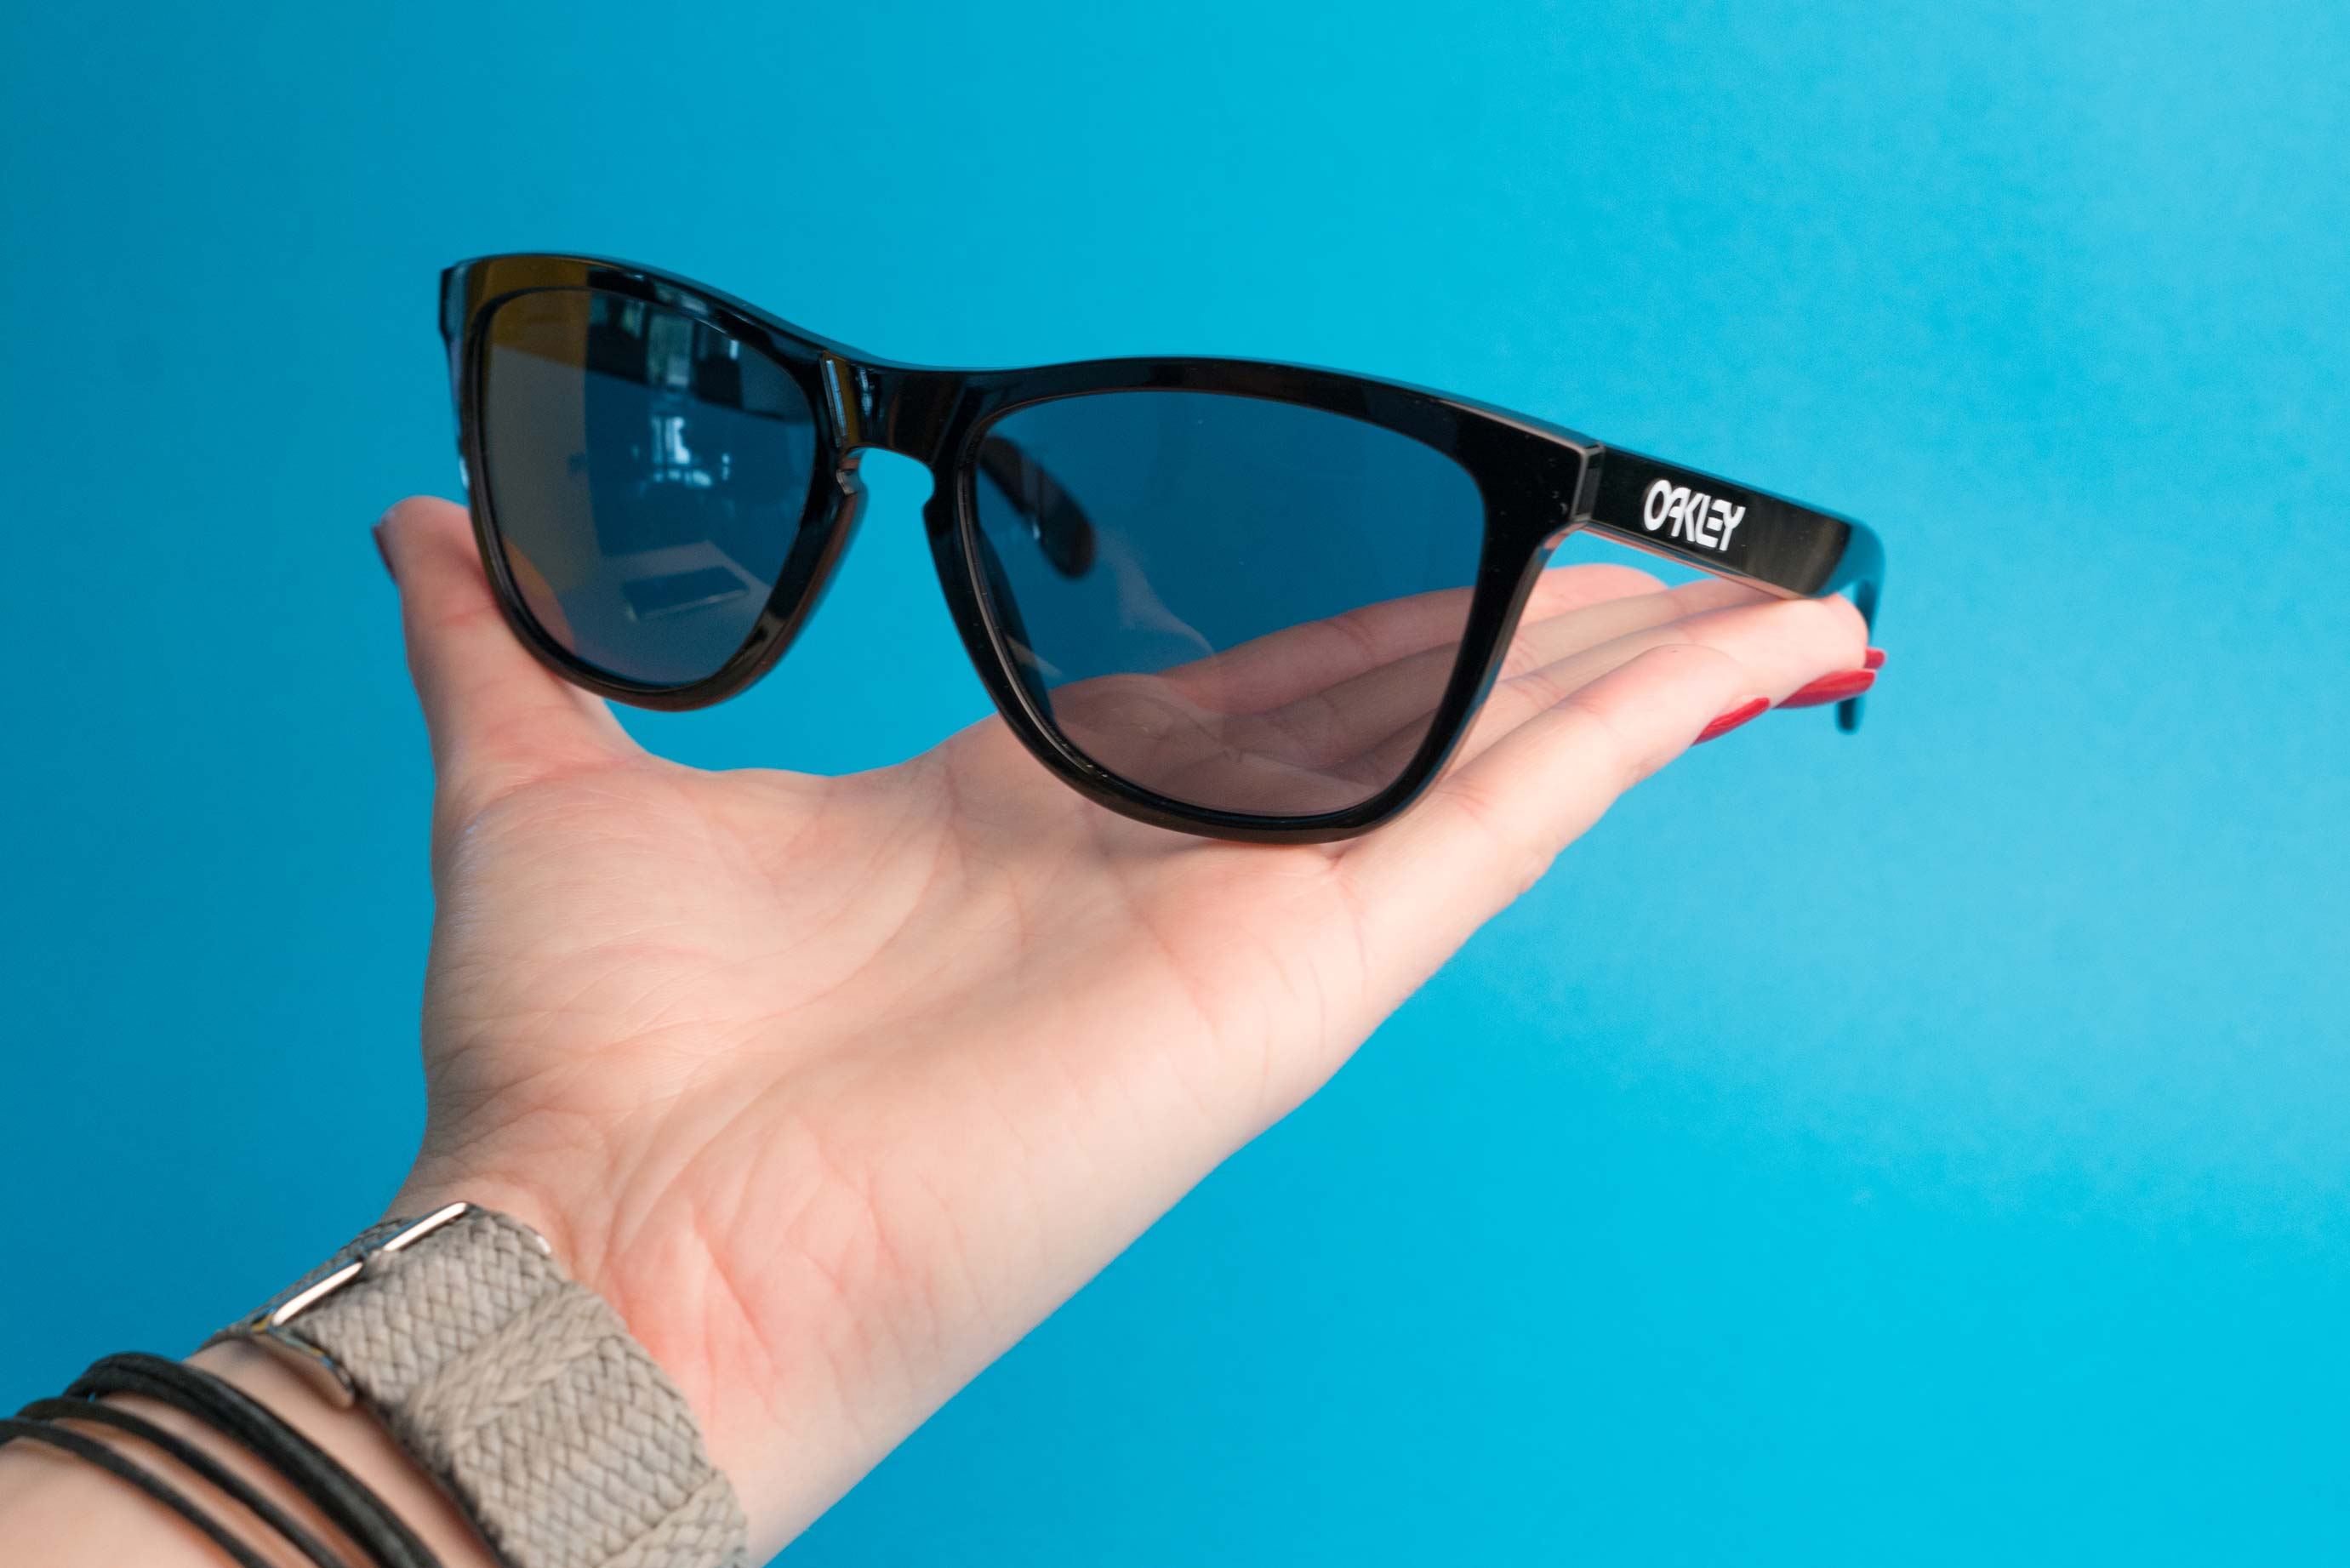 c94294d824274 How to spot authentic Oakley sunglasses   eyerim blog